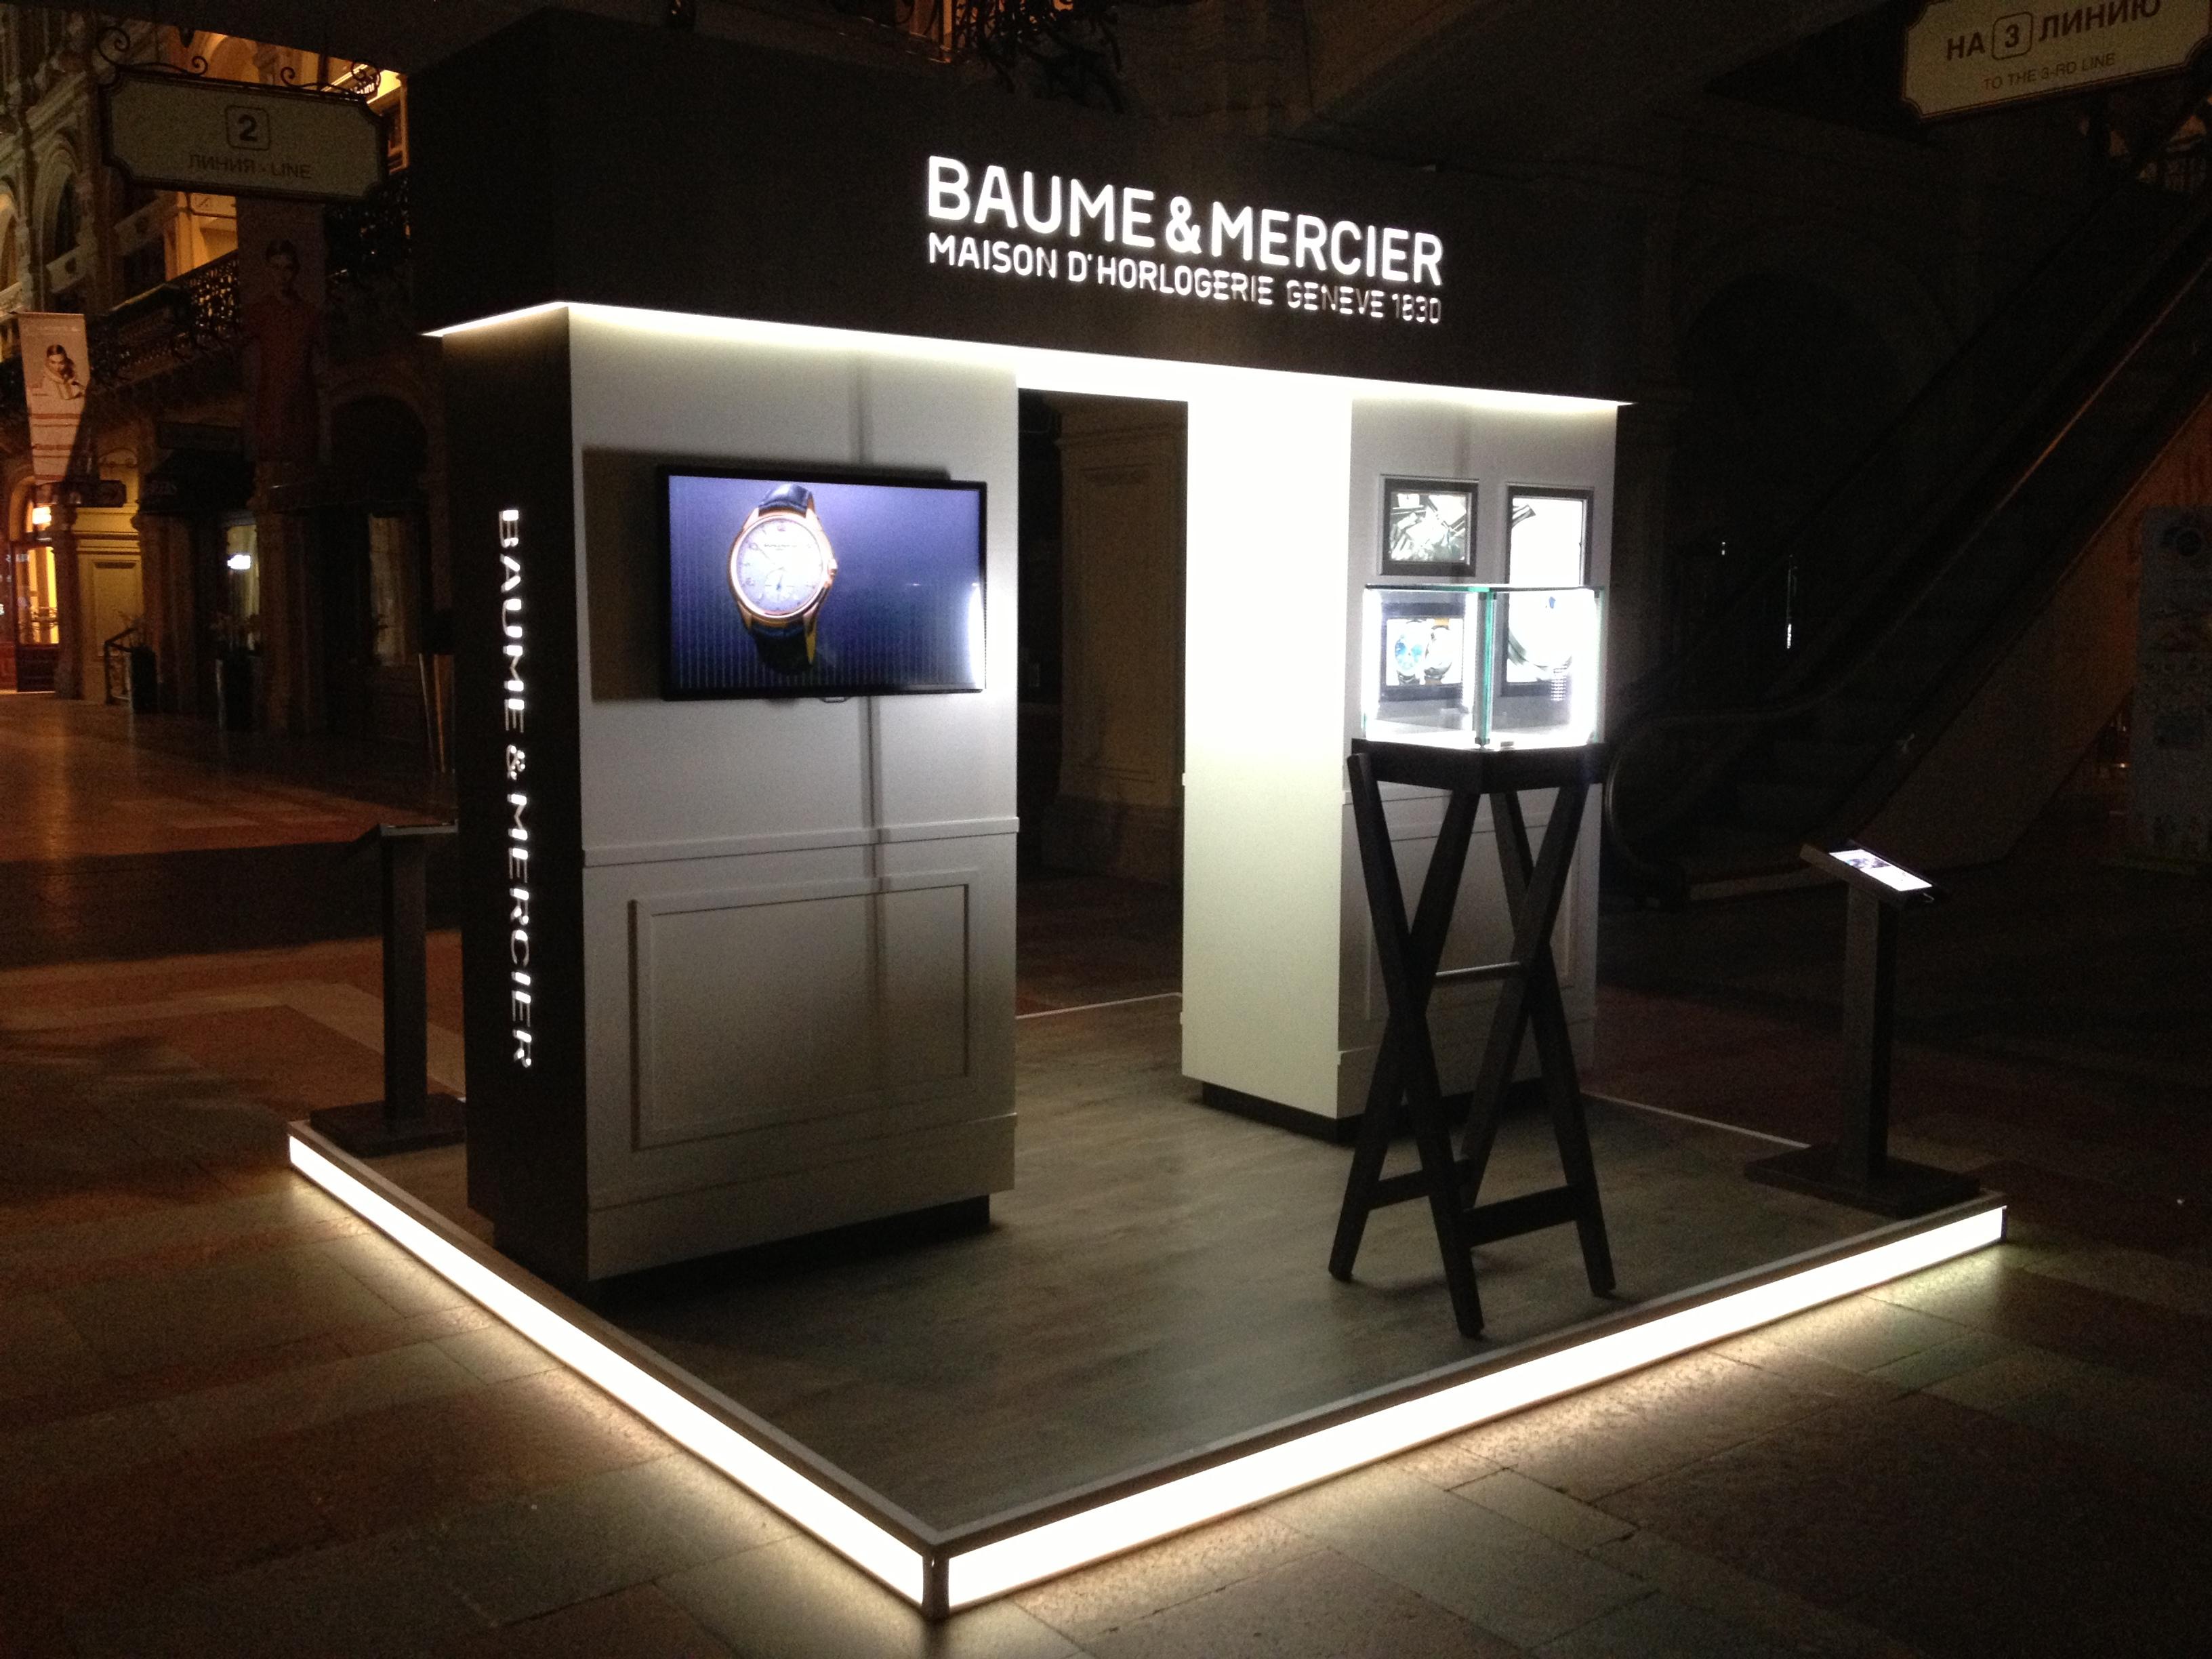 Baume&MercierГУМ